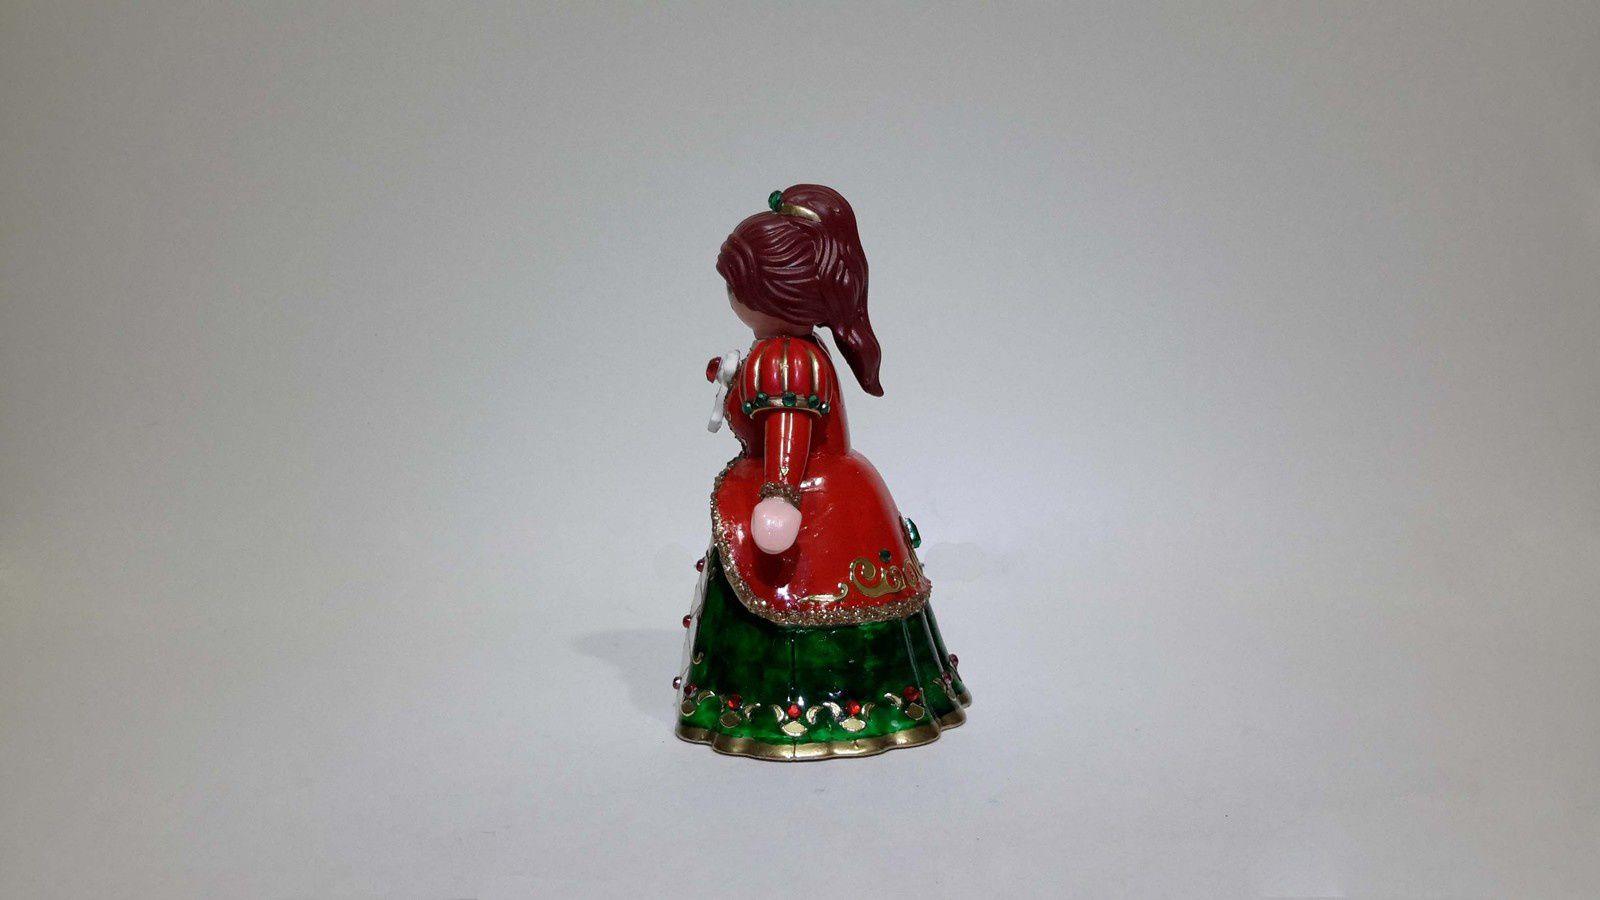 l'Esprit de Noël... l'esprit des fêtes!